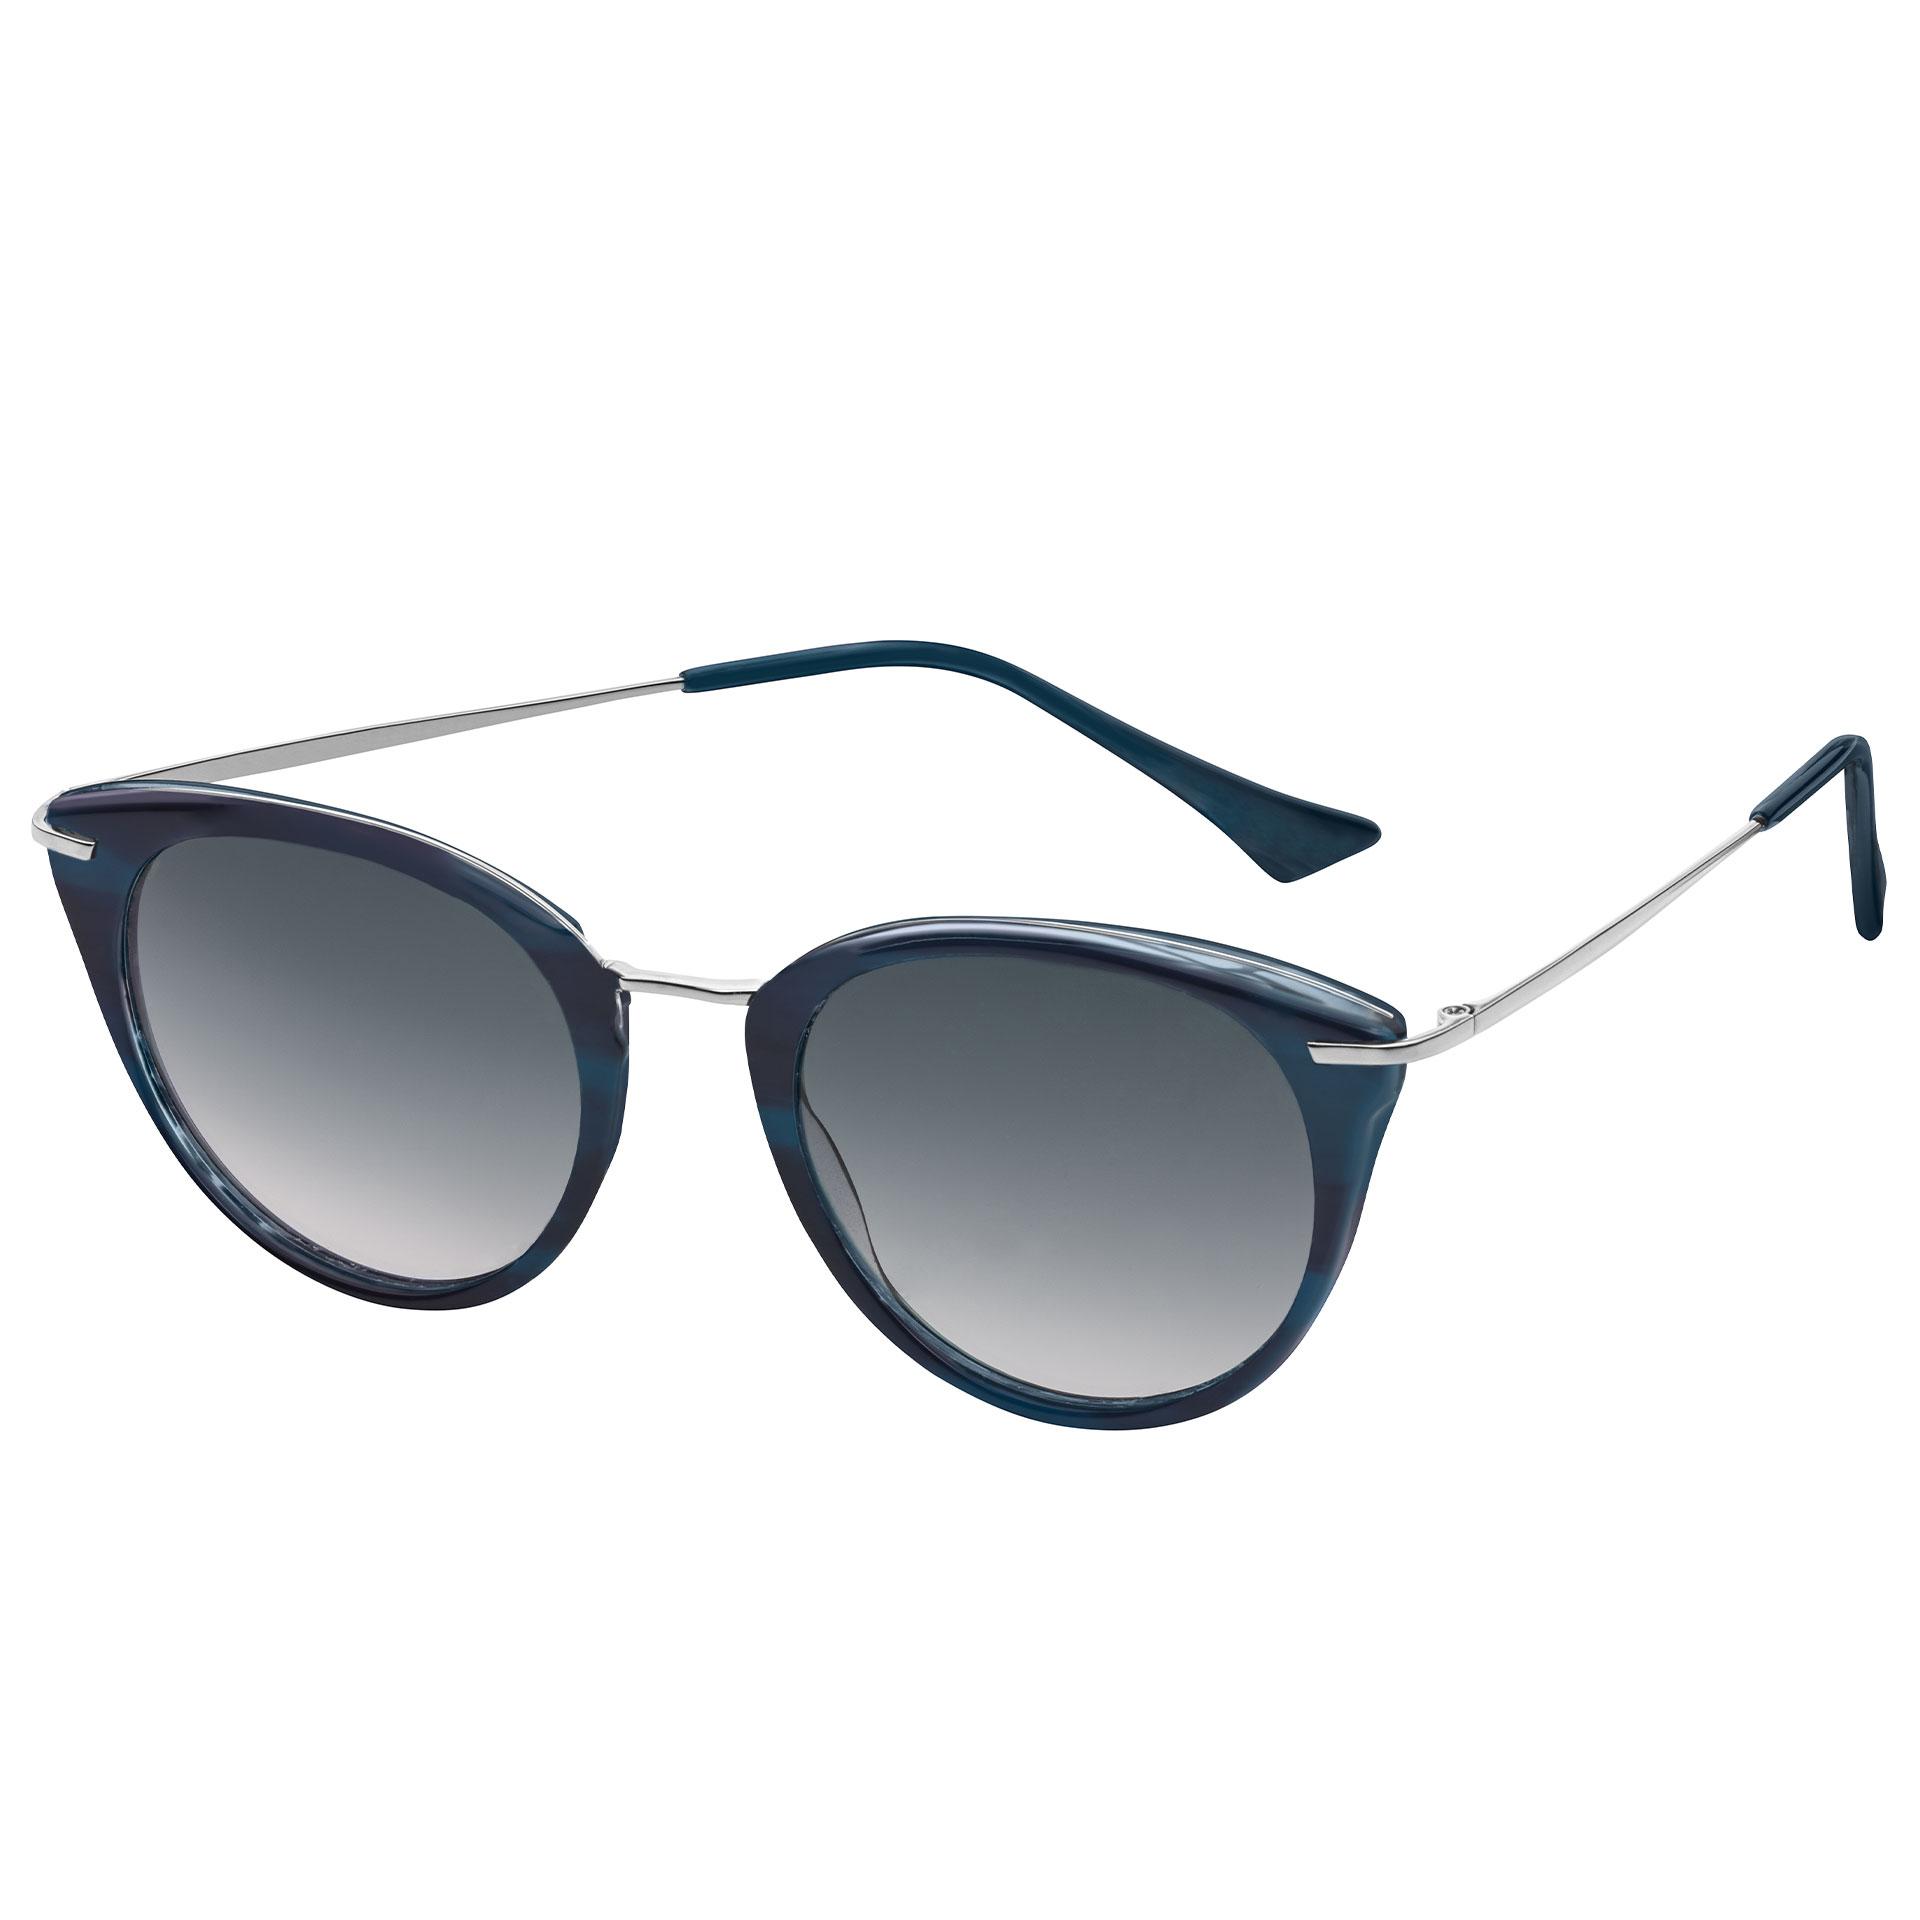 Mercedes-Benz Sonnenbrille Damen Casual